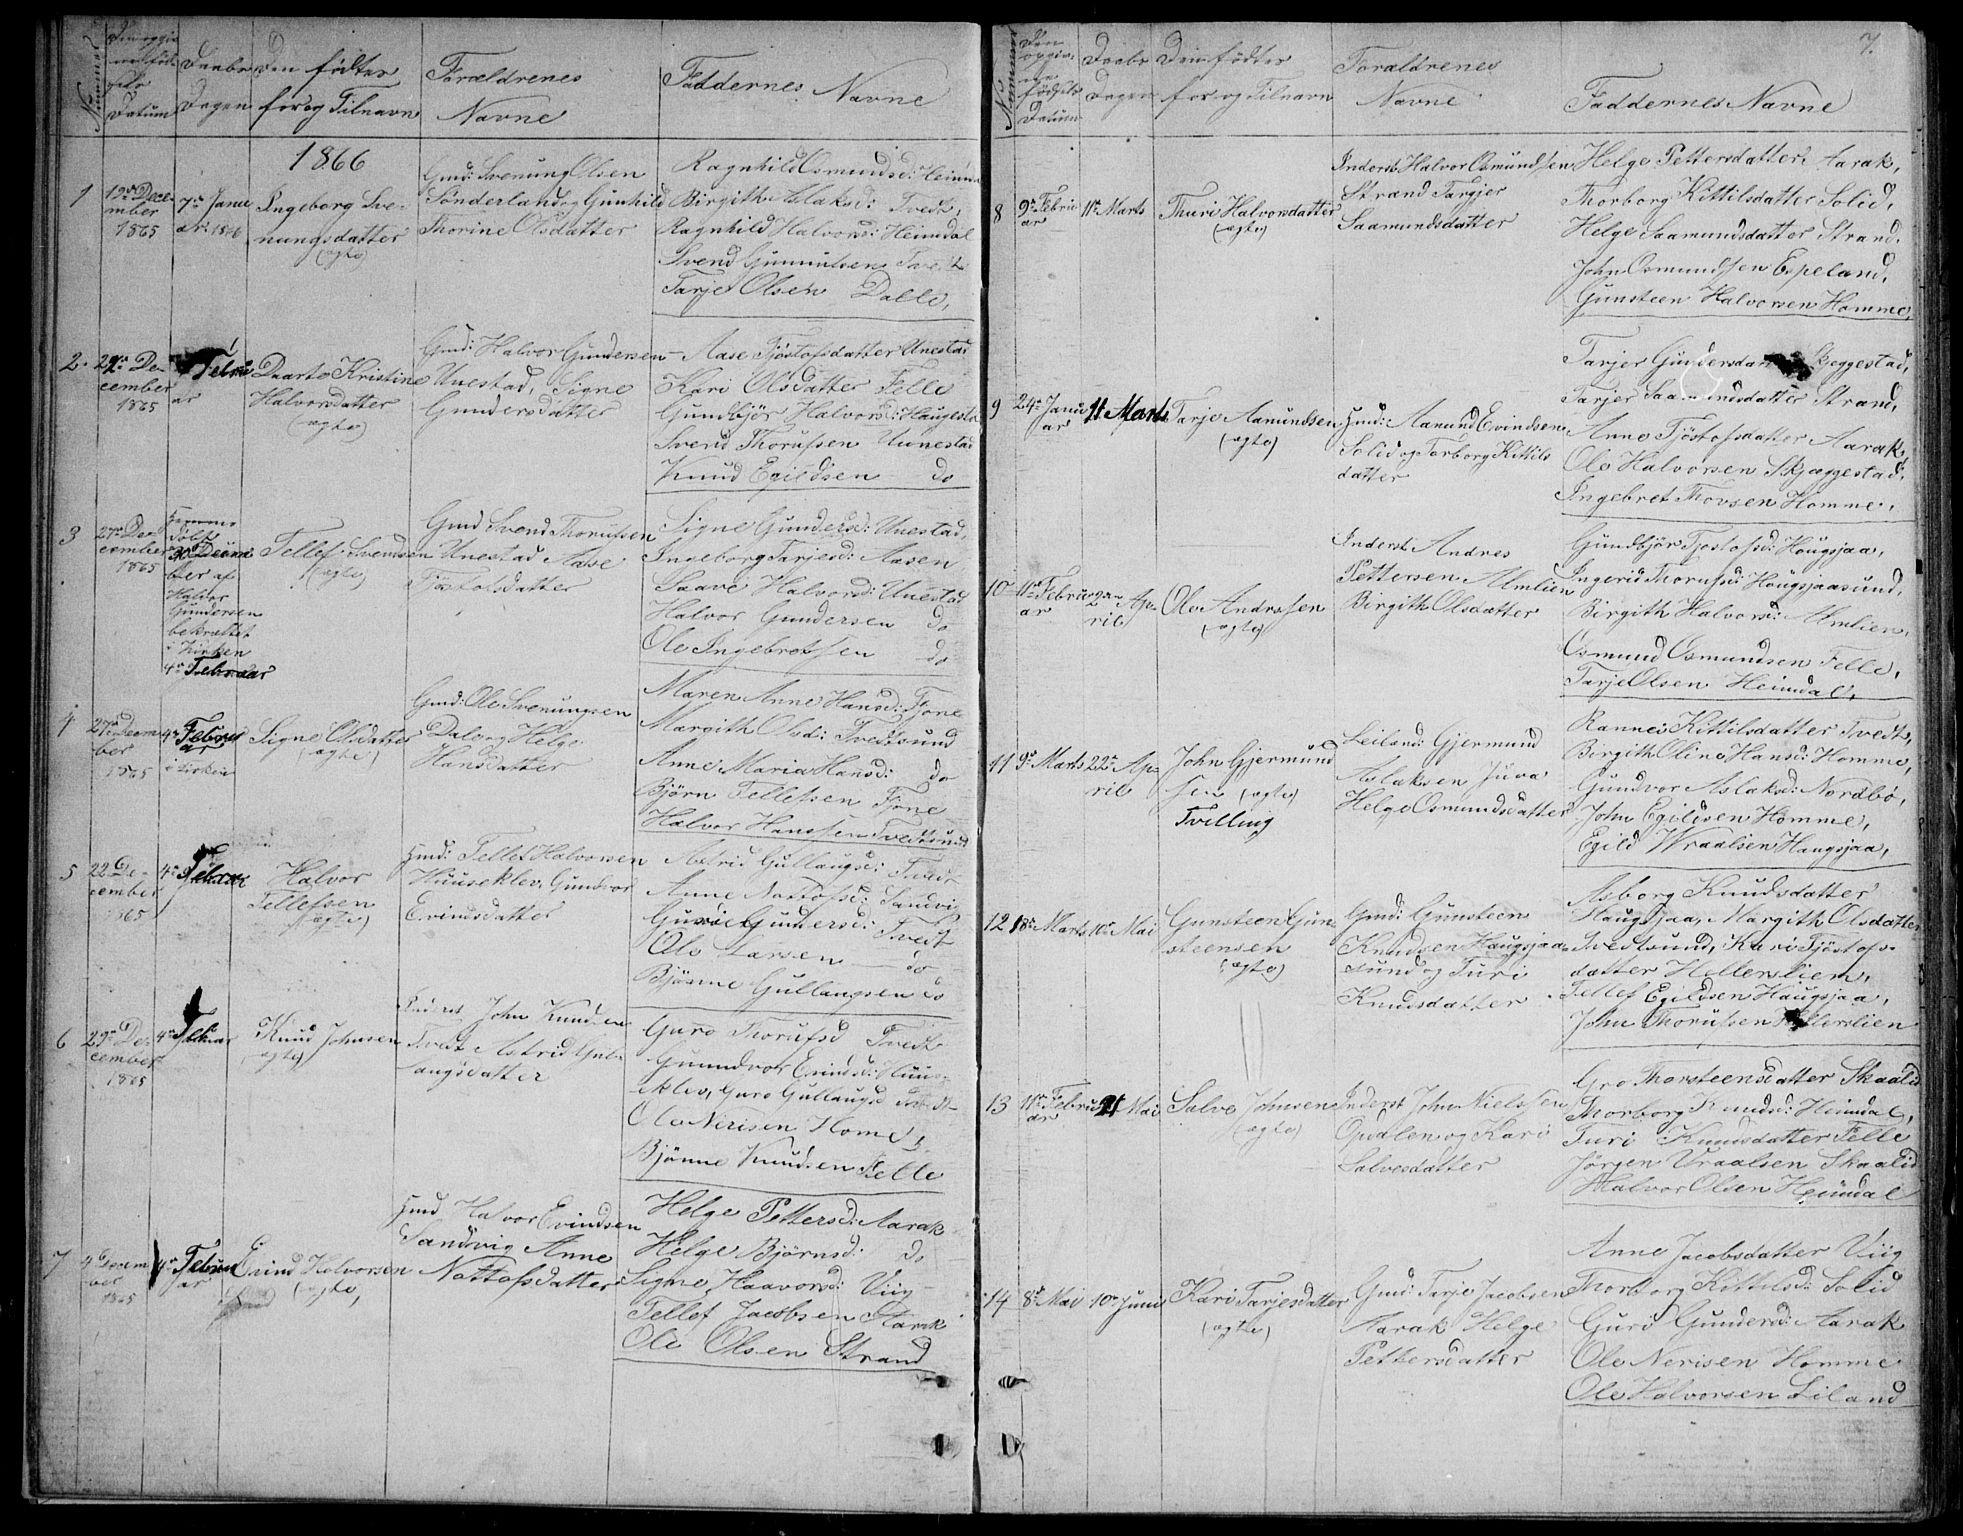 SAKO, Nissedal kirkebøker, G/Gb/L0002: Klokkerbok nr. II 2, 1863-1892, s. 7